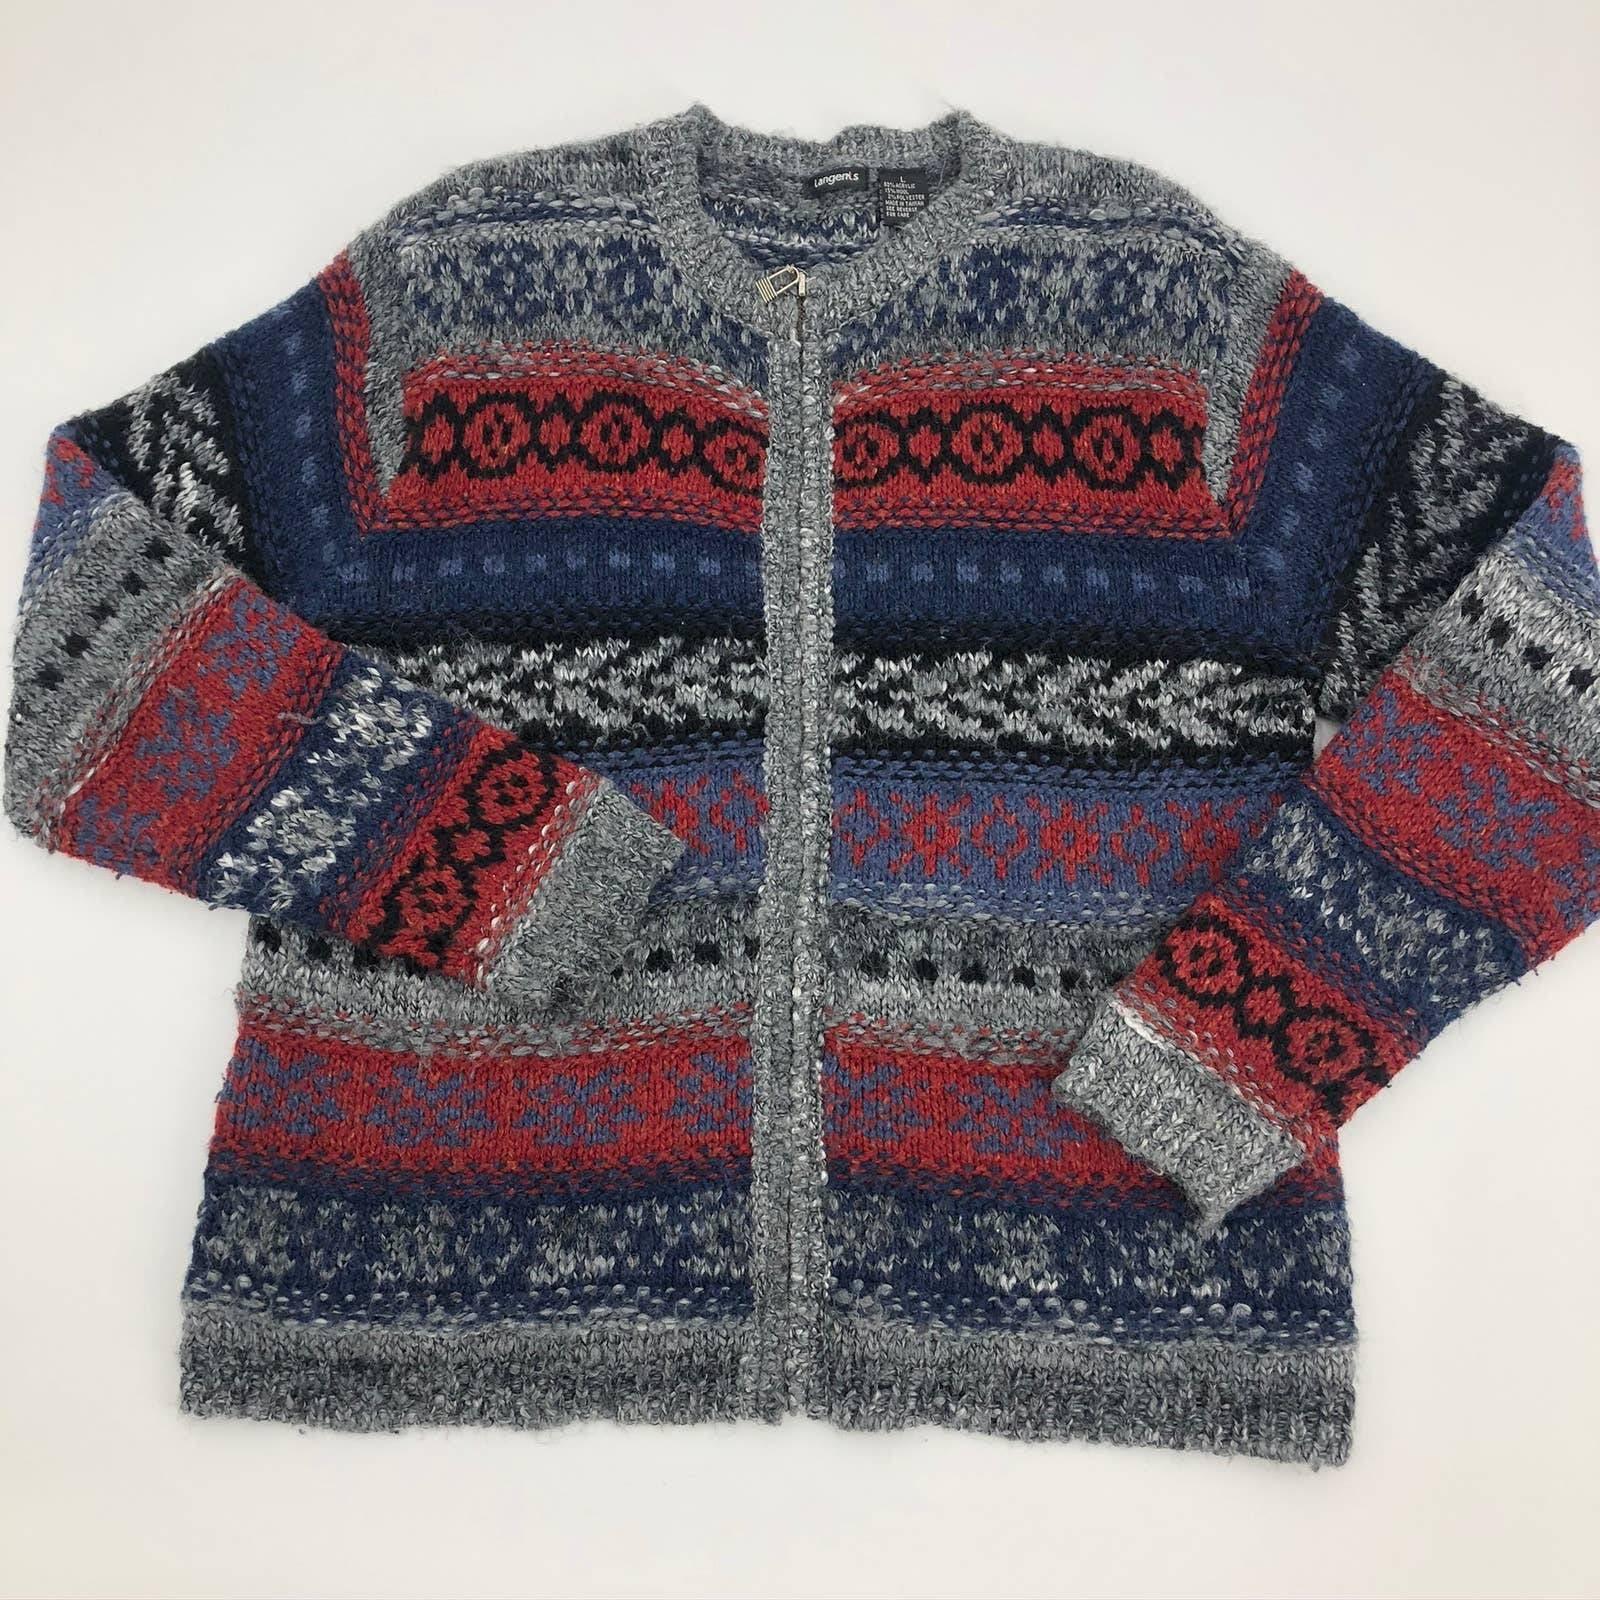 Tangents Large Zip Cardigan Wool Blend